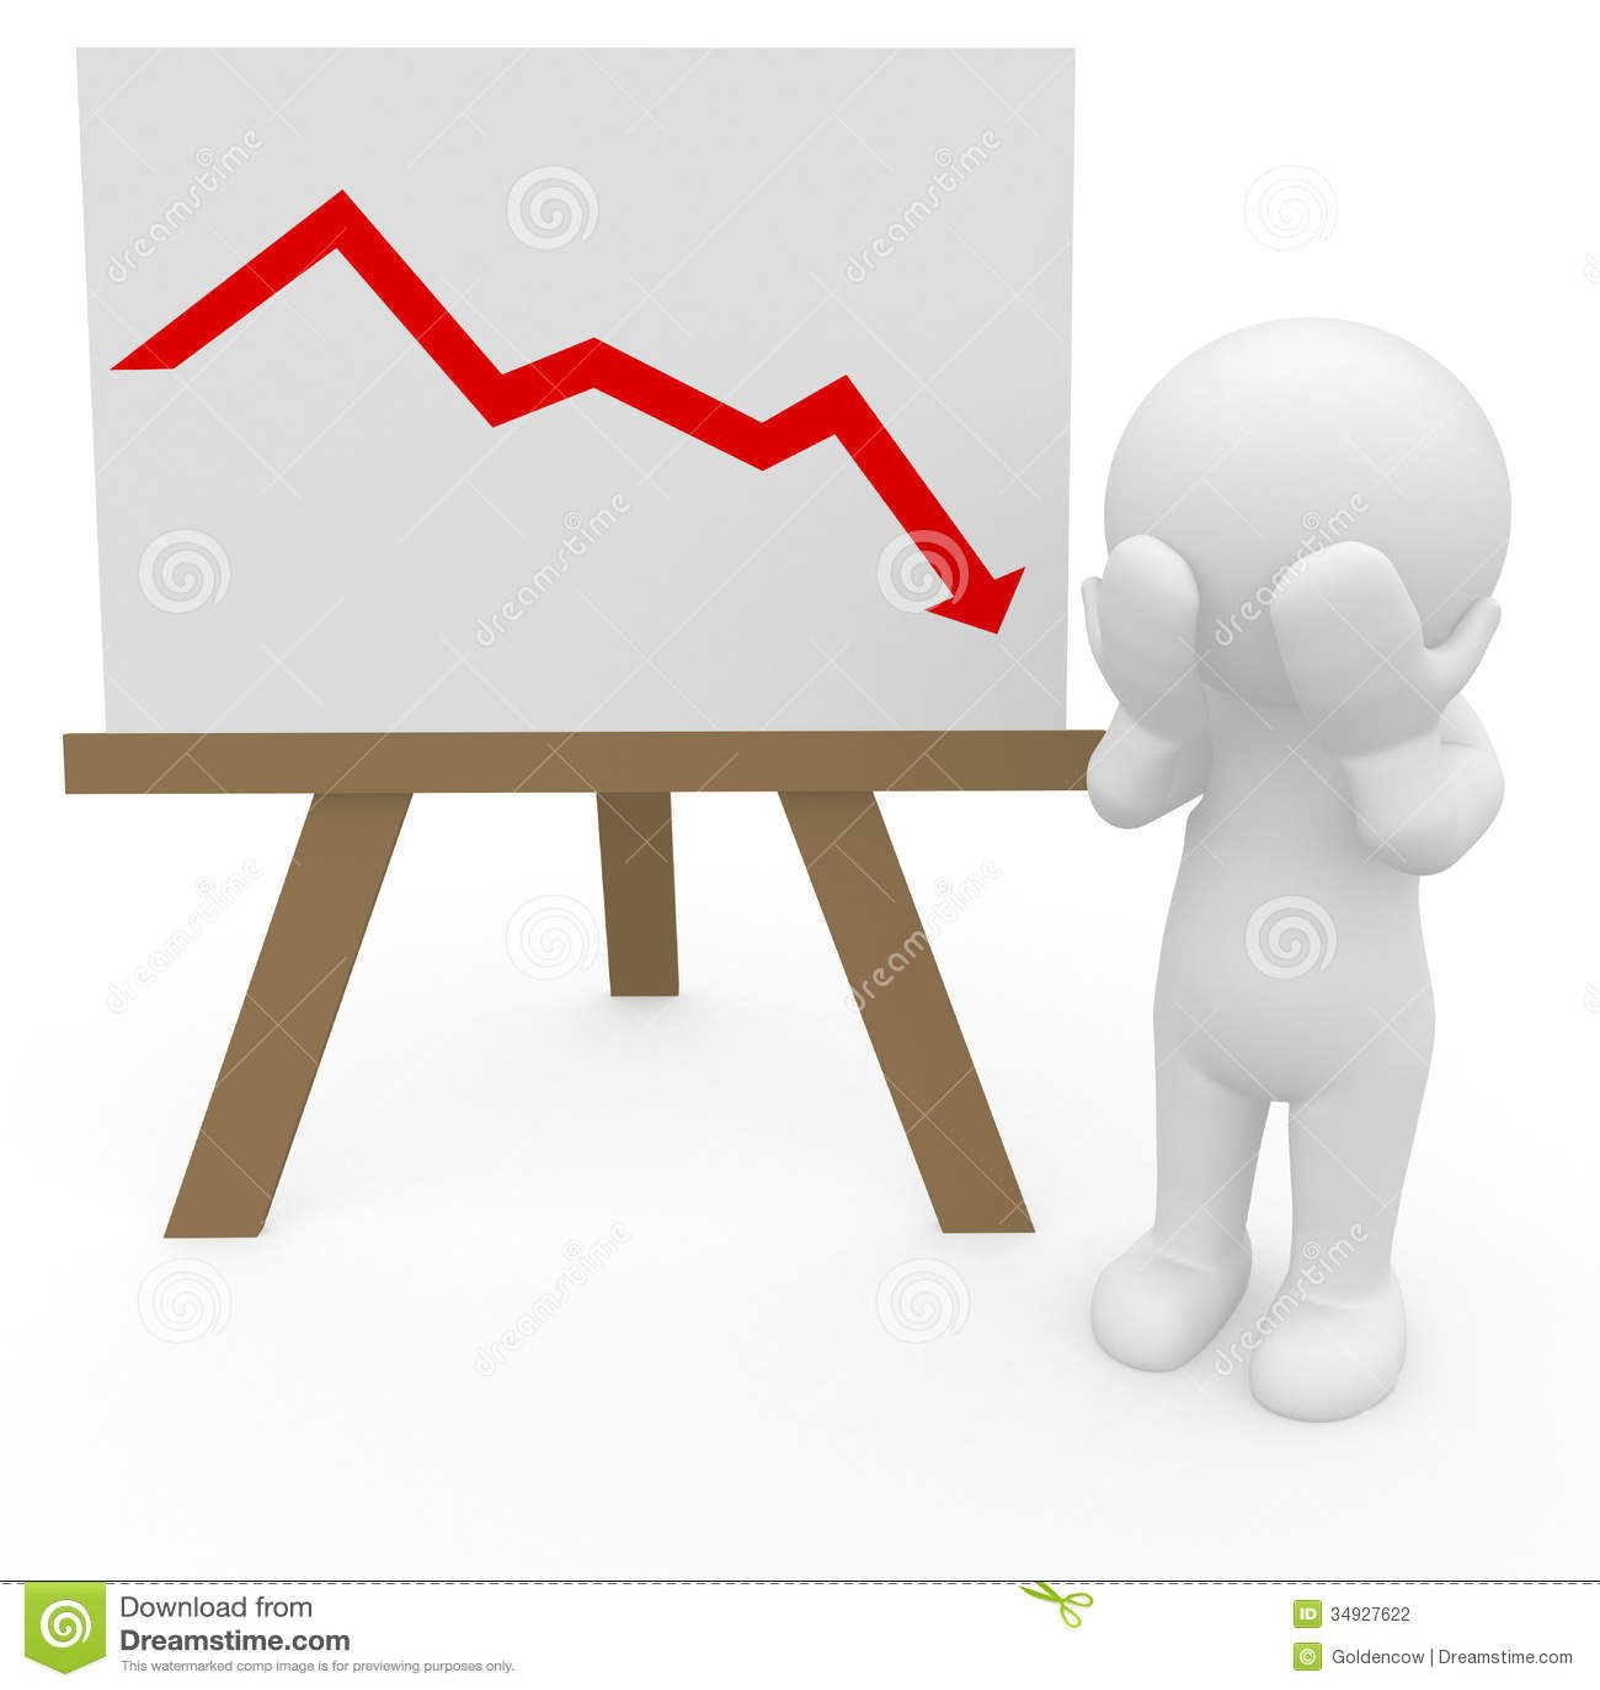 Home Design 3d Keeps Crashing: Equities Crash On Whiteboard Stock Photography